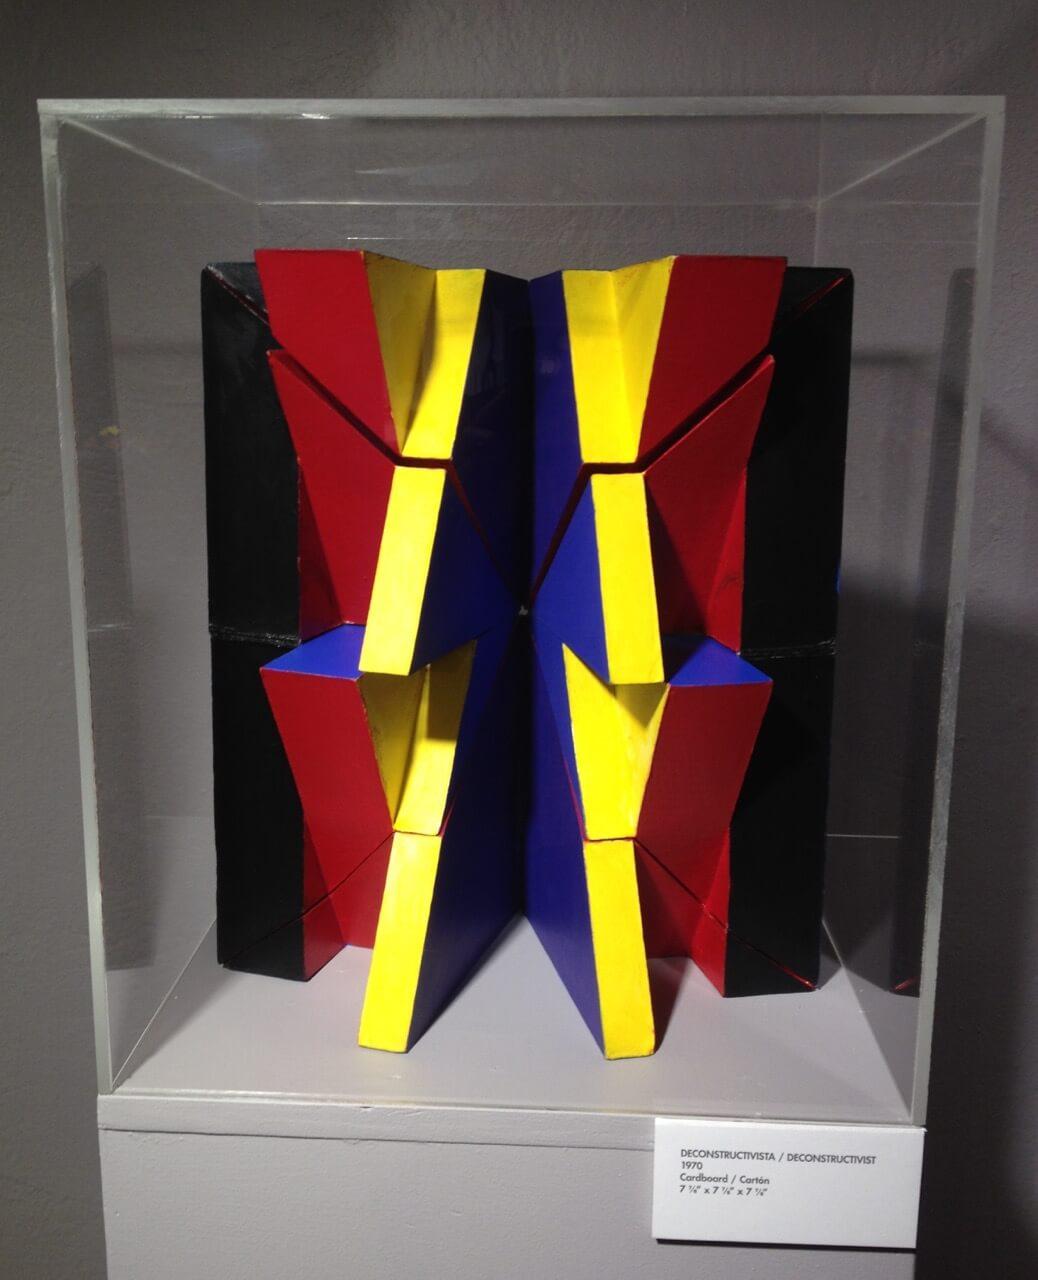 """Deconstructivista,"" 1970, cardboard, 7 ⅞ x 7 ⅞ x 7 ⅞ inches"